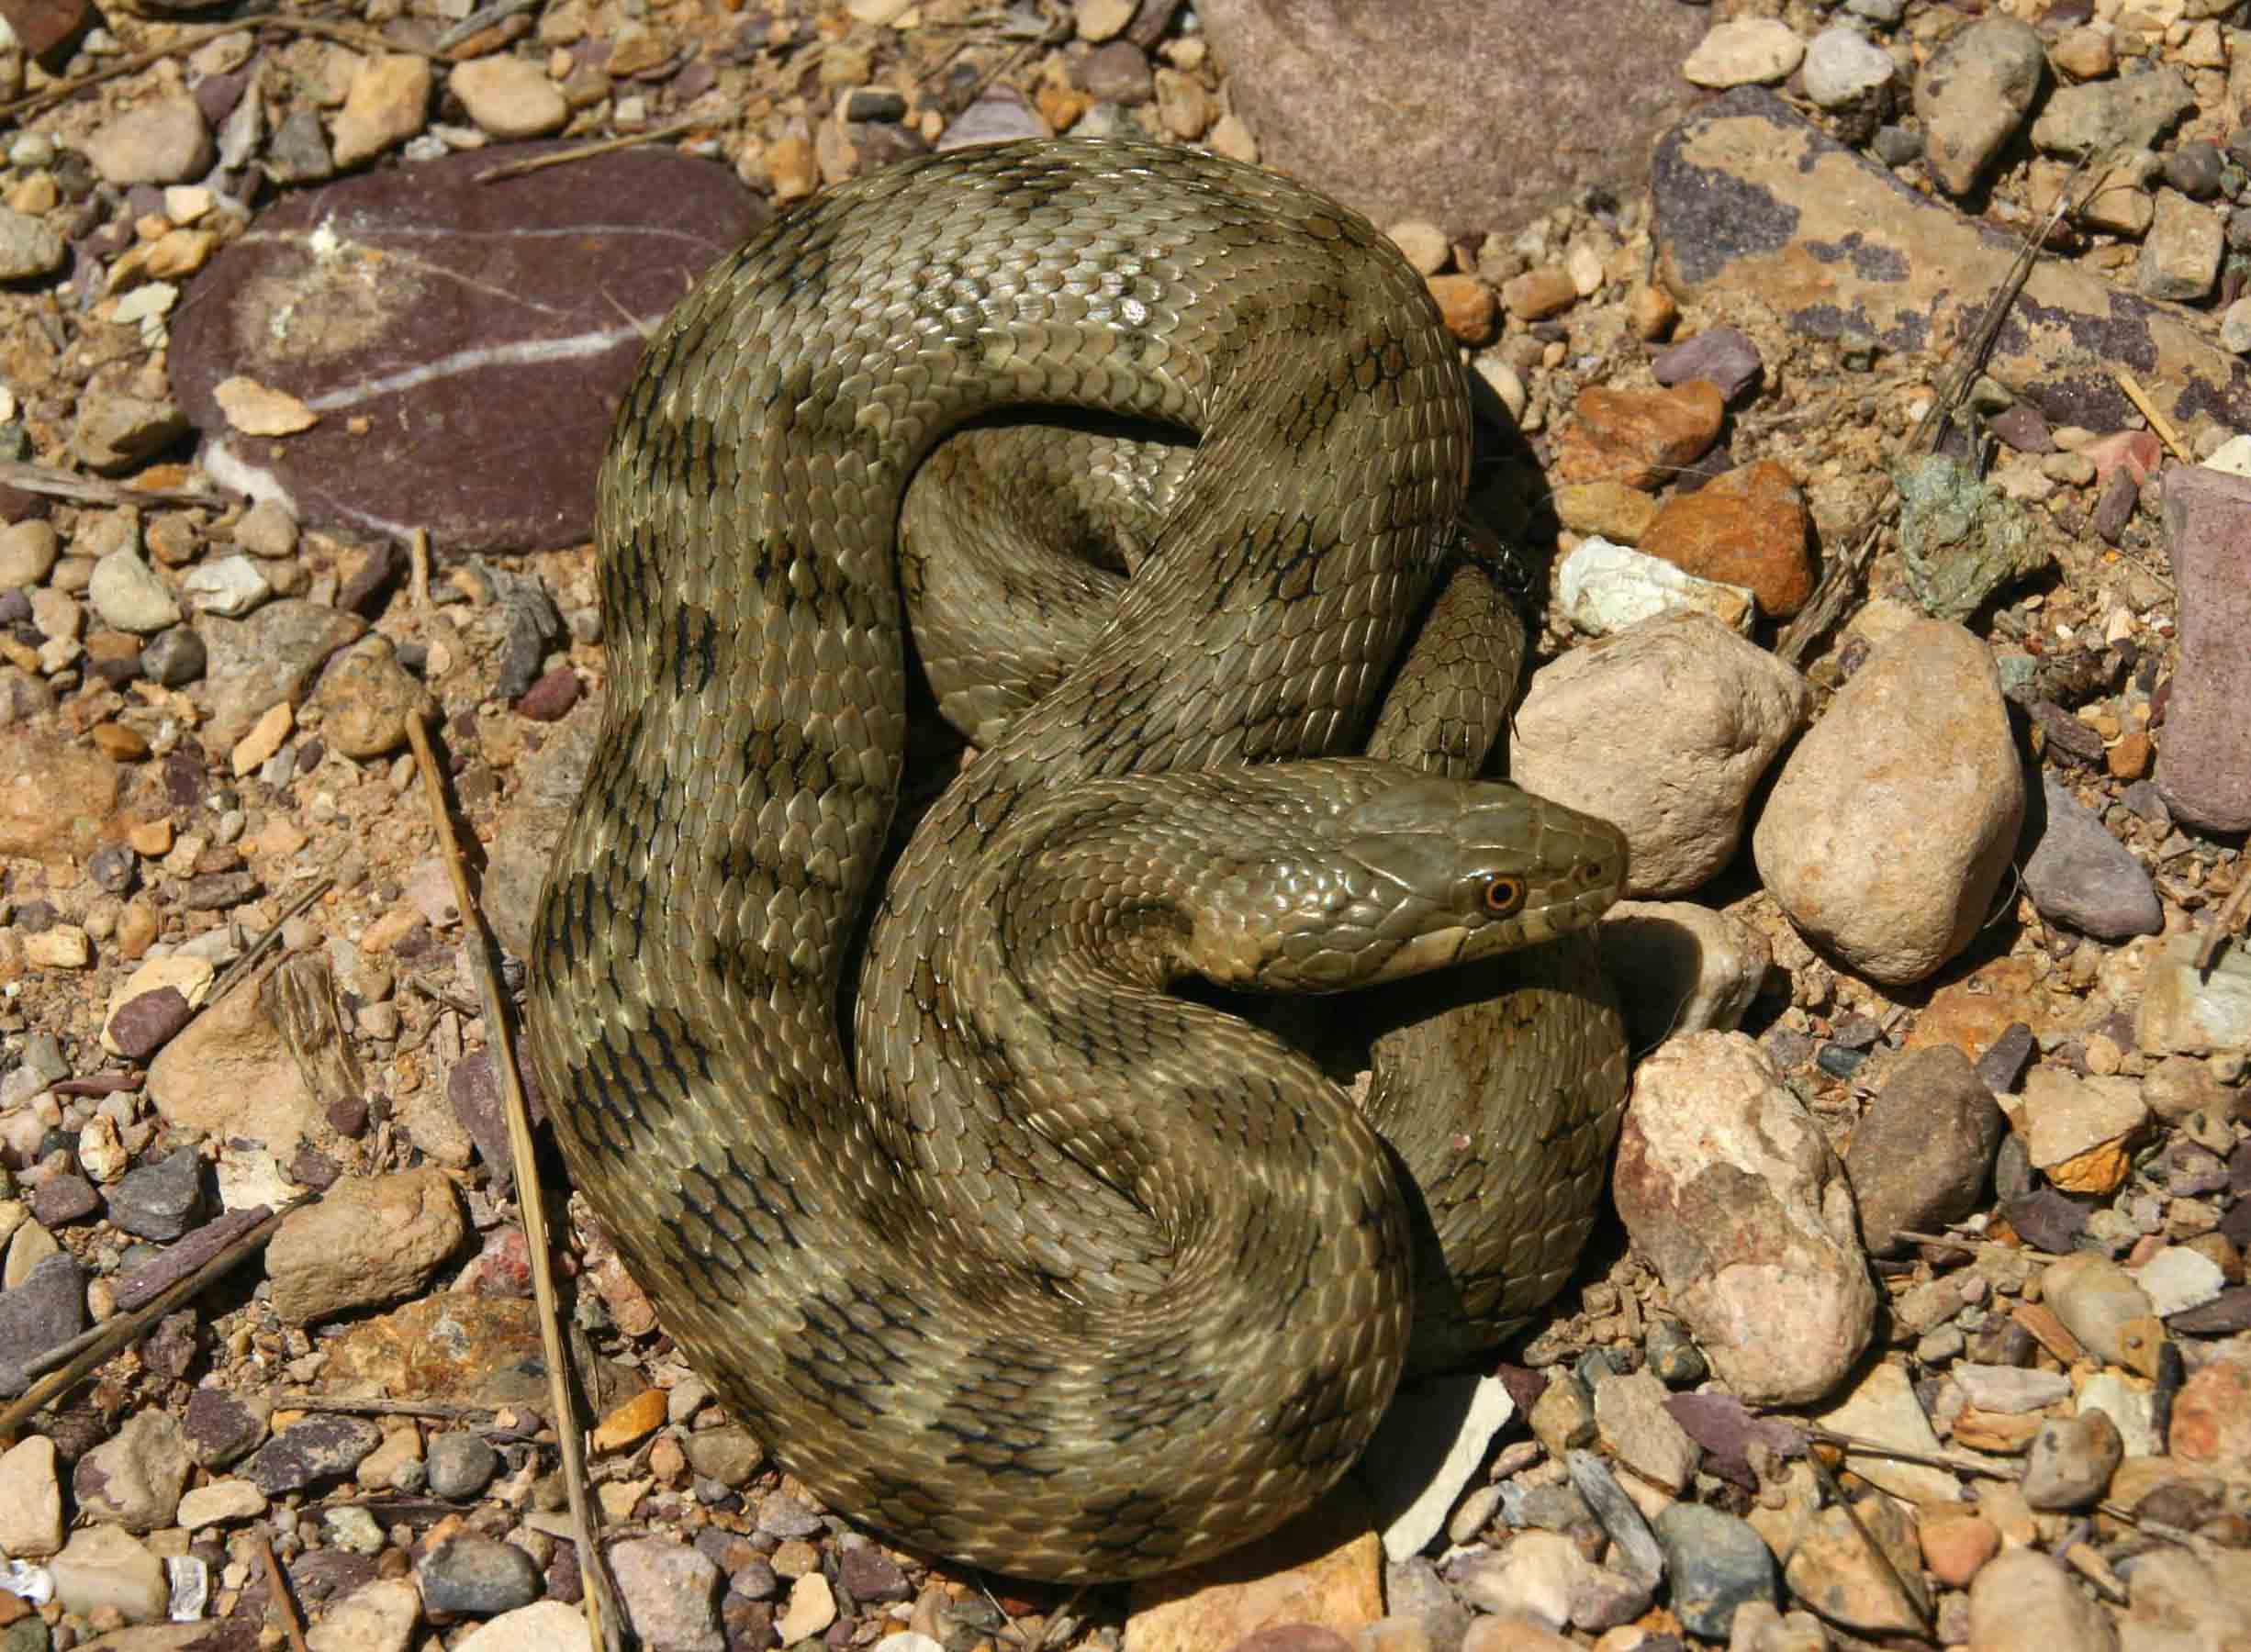 Another viperine snake (Natrix maura)